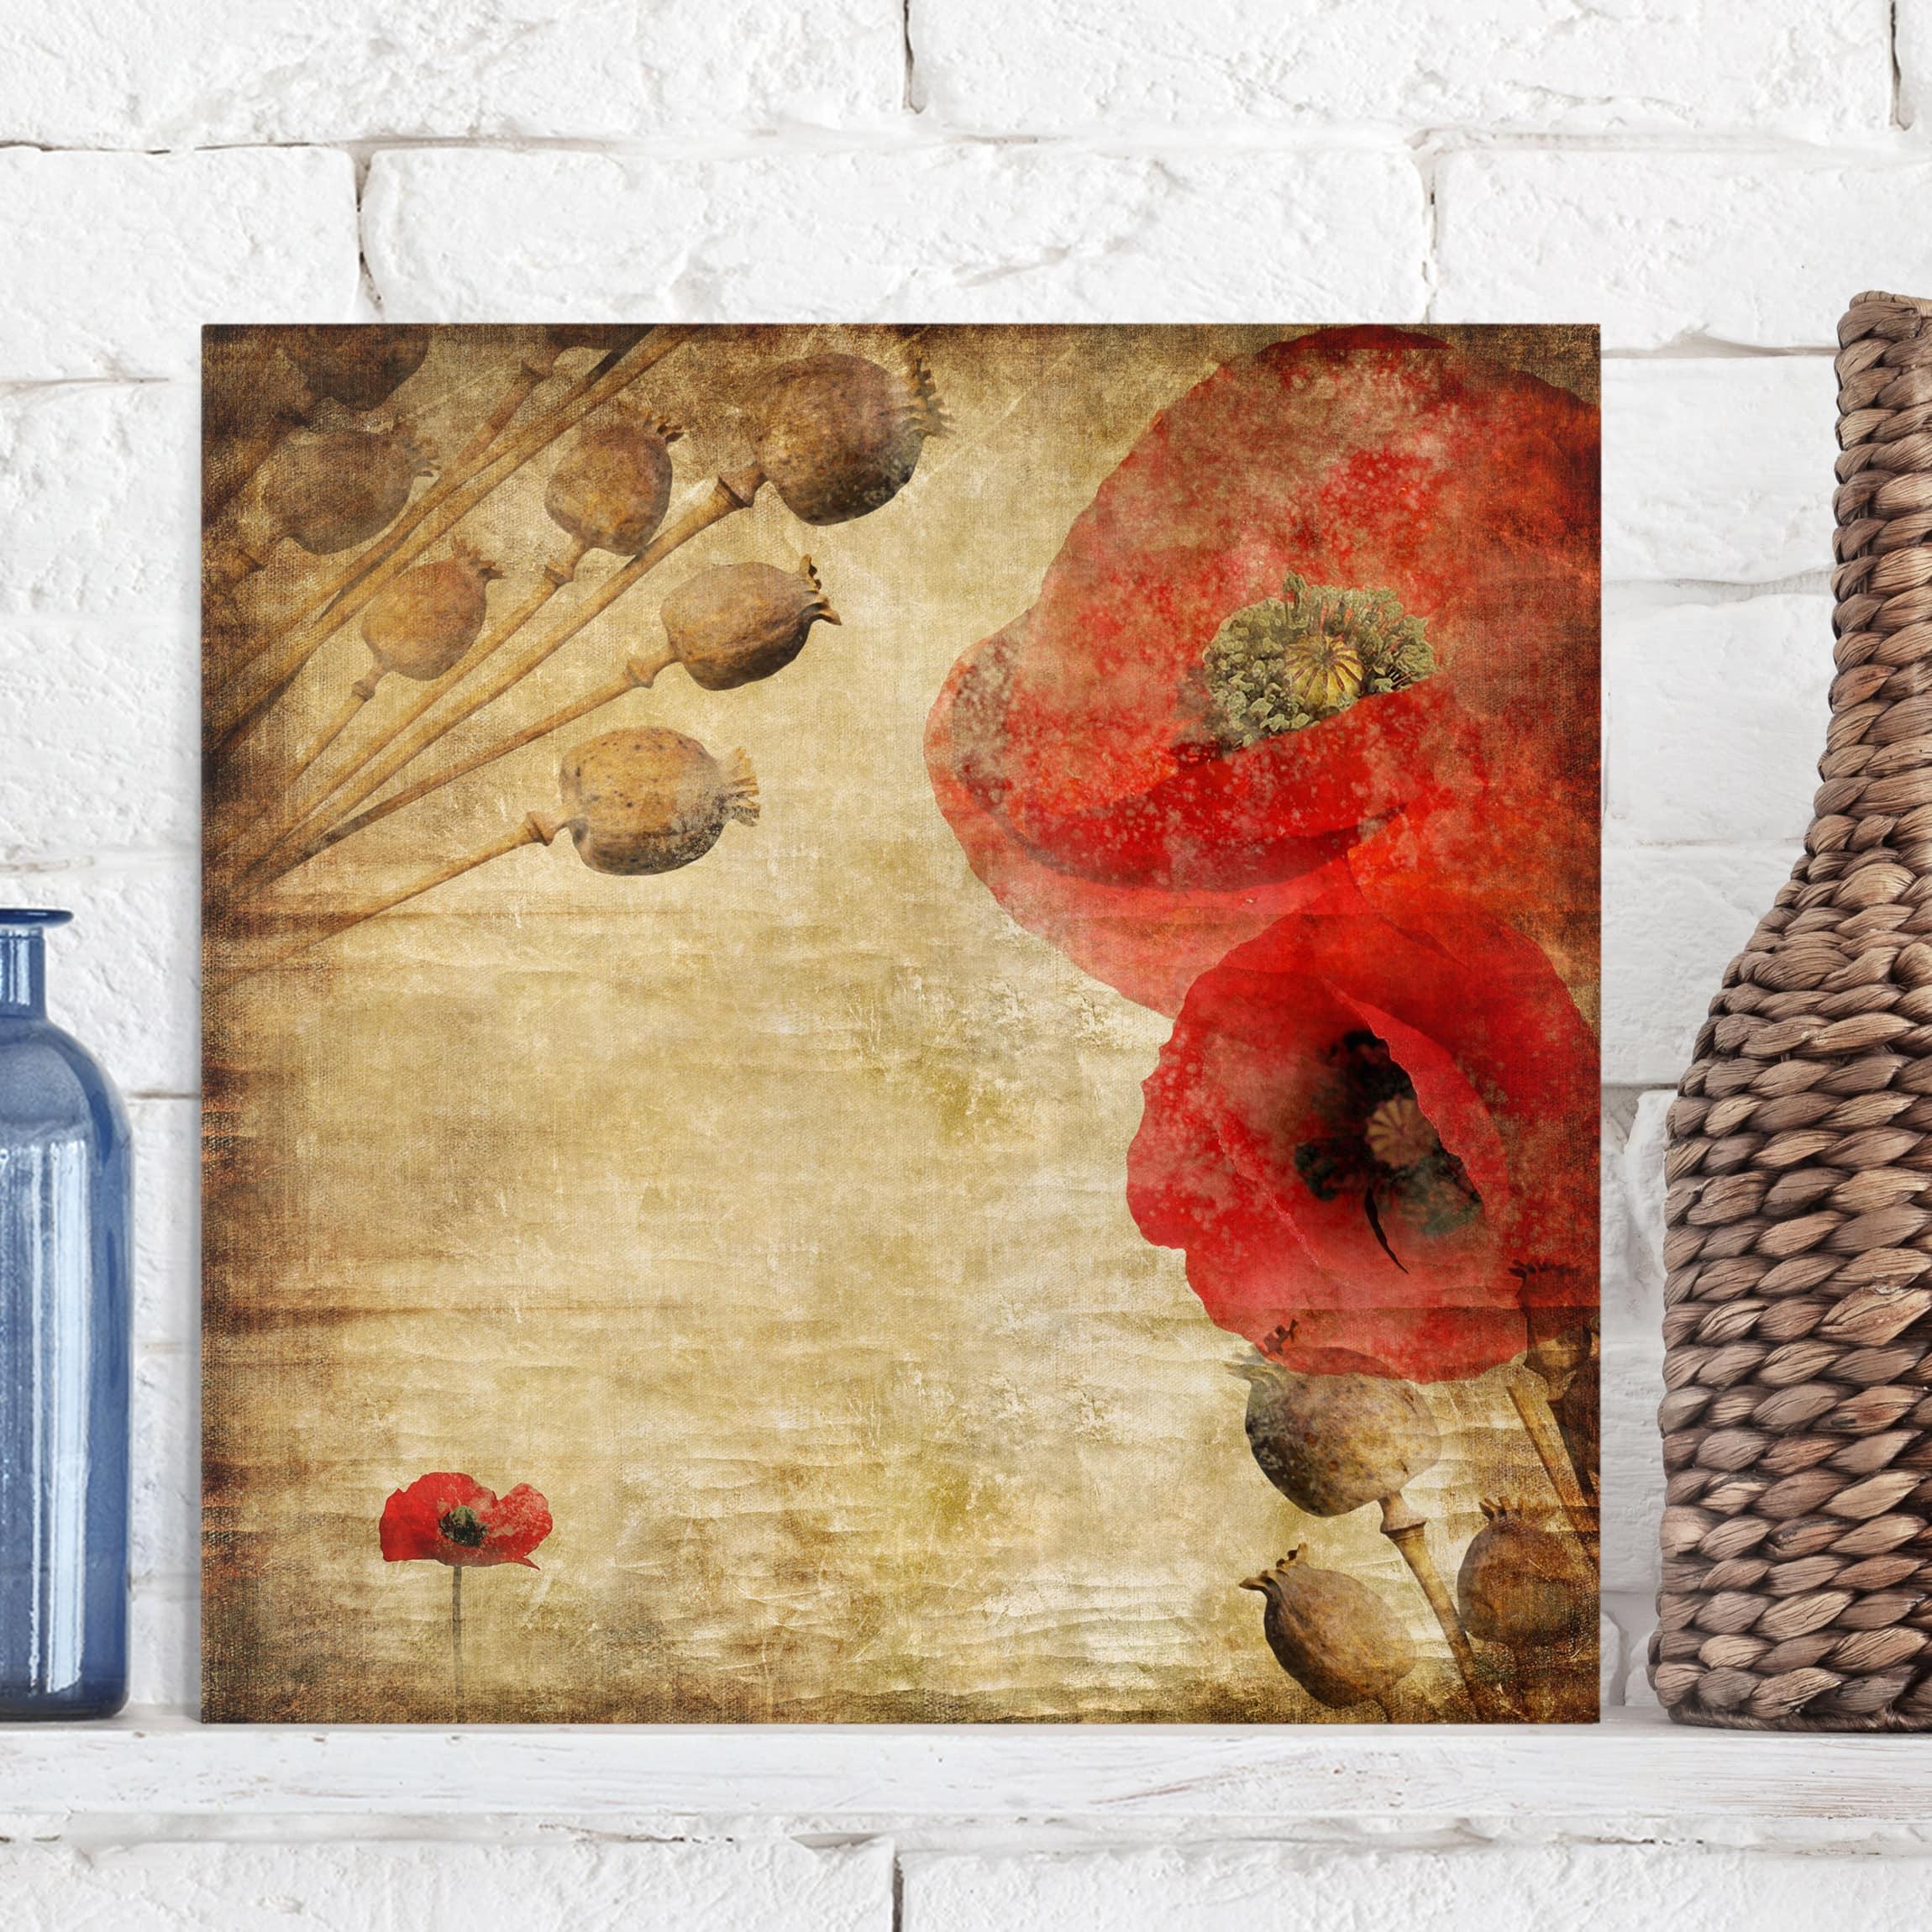 Canvas Art - Poppy Flower - Square Format 1:1